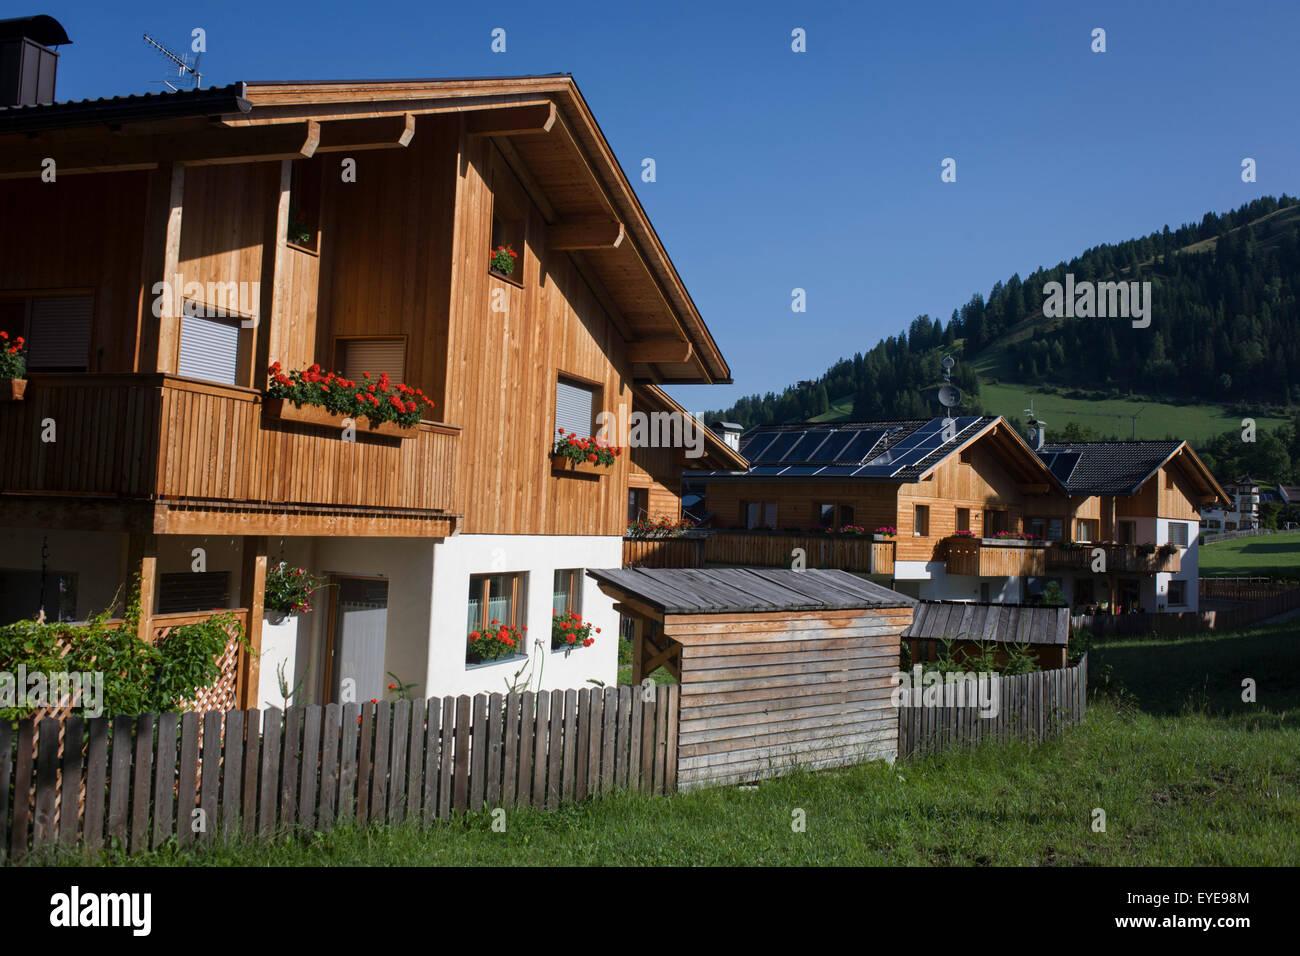 architecture moderne maison tyrolienne dans leonhard-st leonardo, un